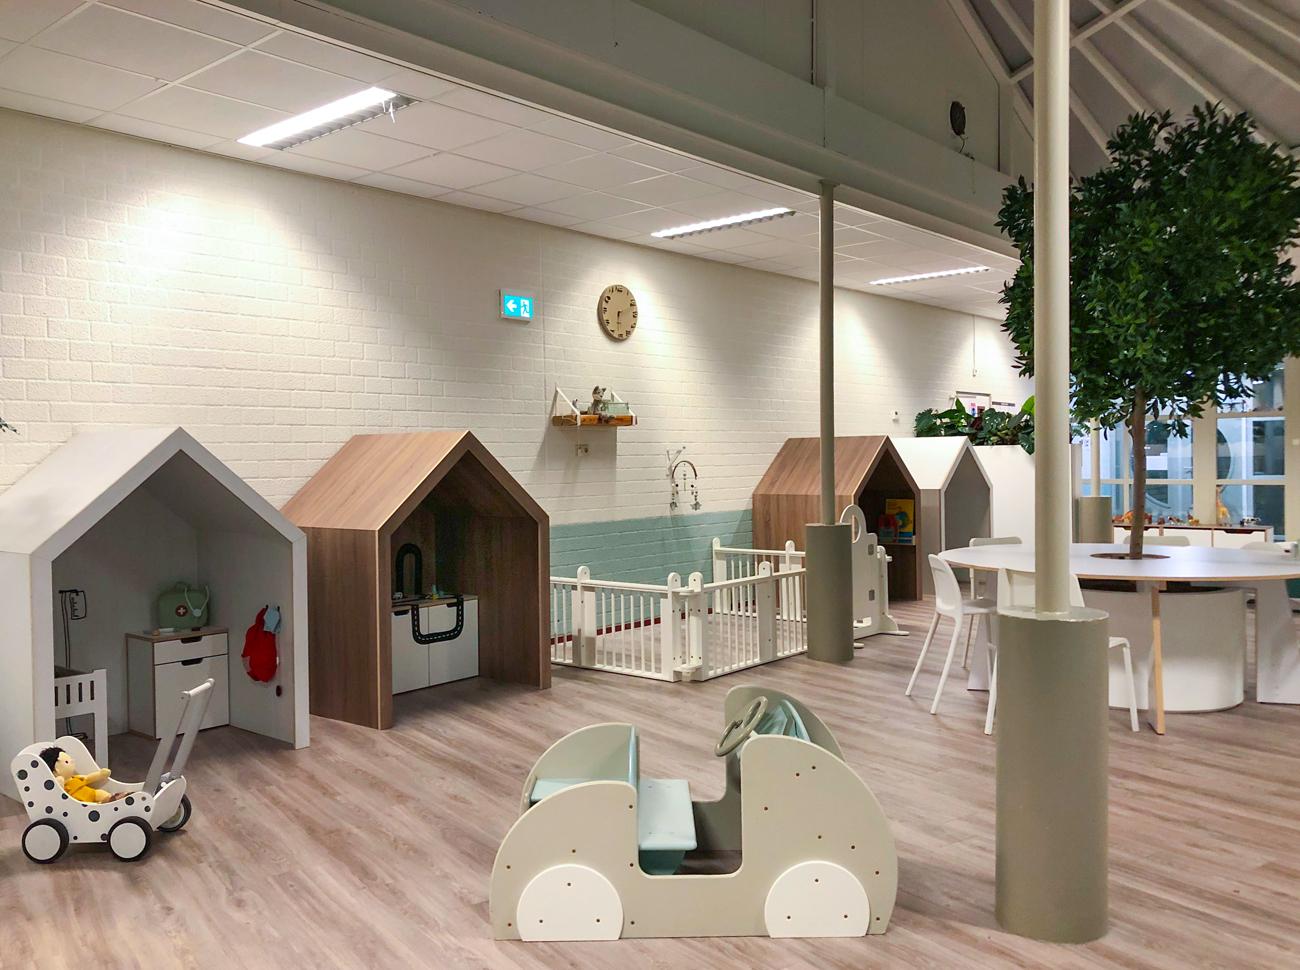 minimam interieur ontwerp inrichting de kinderkeet amc amsterdam